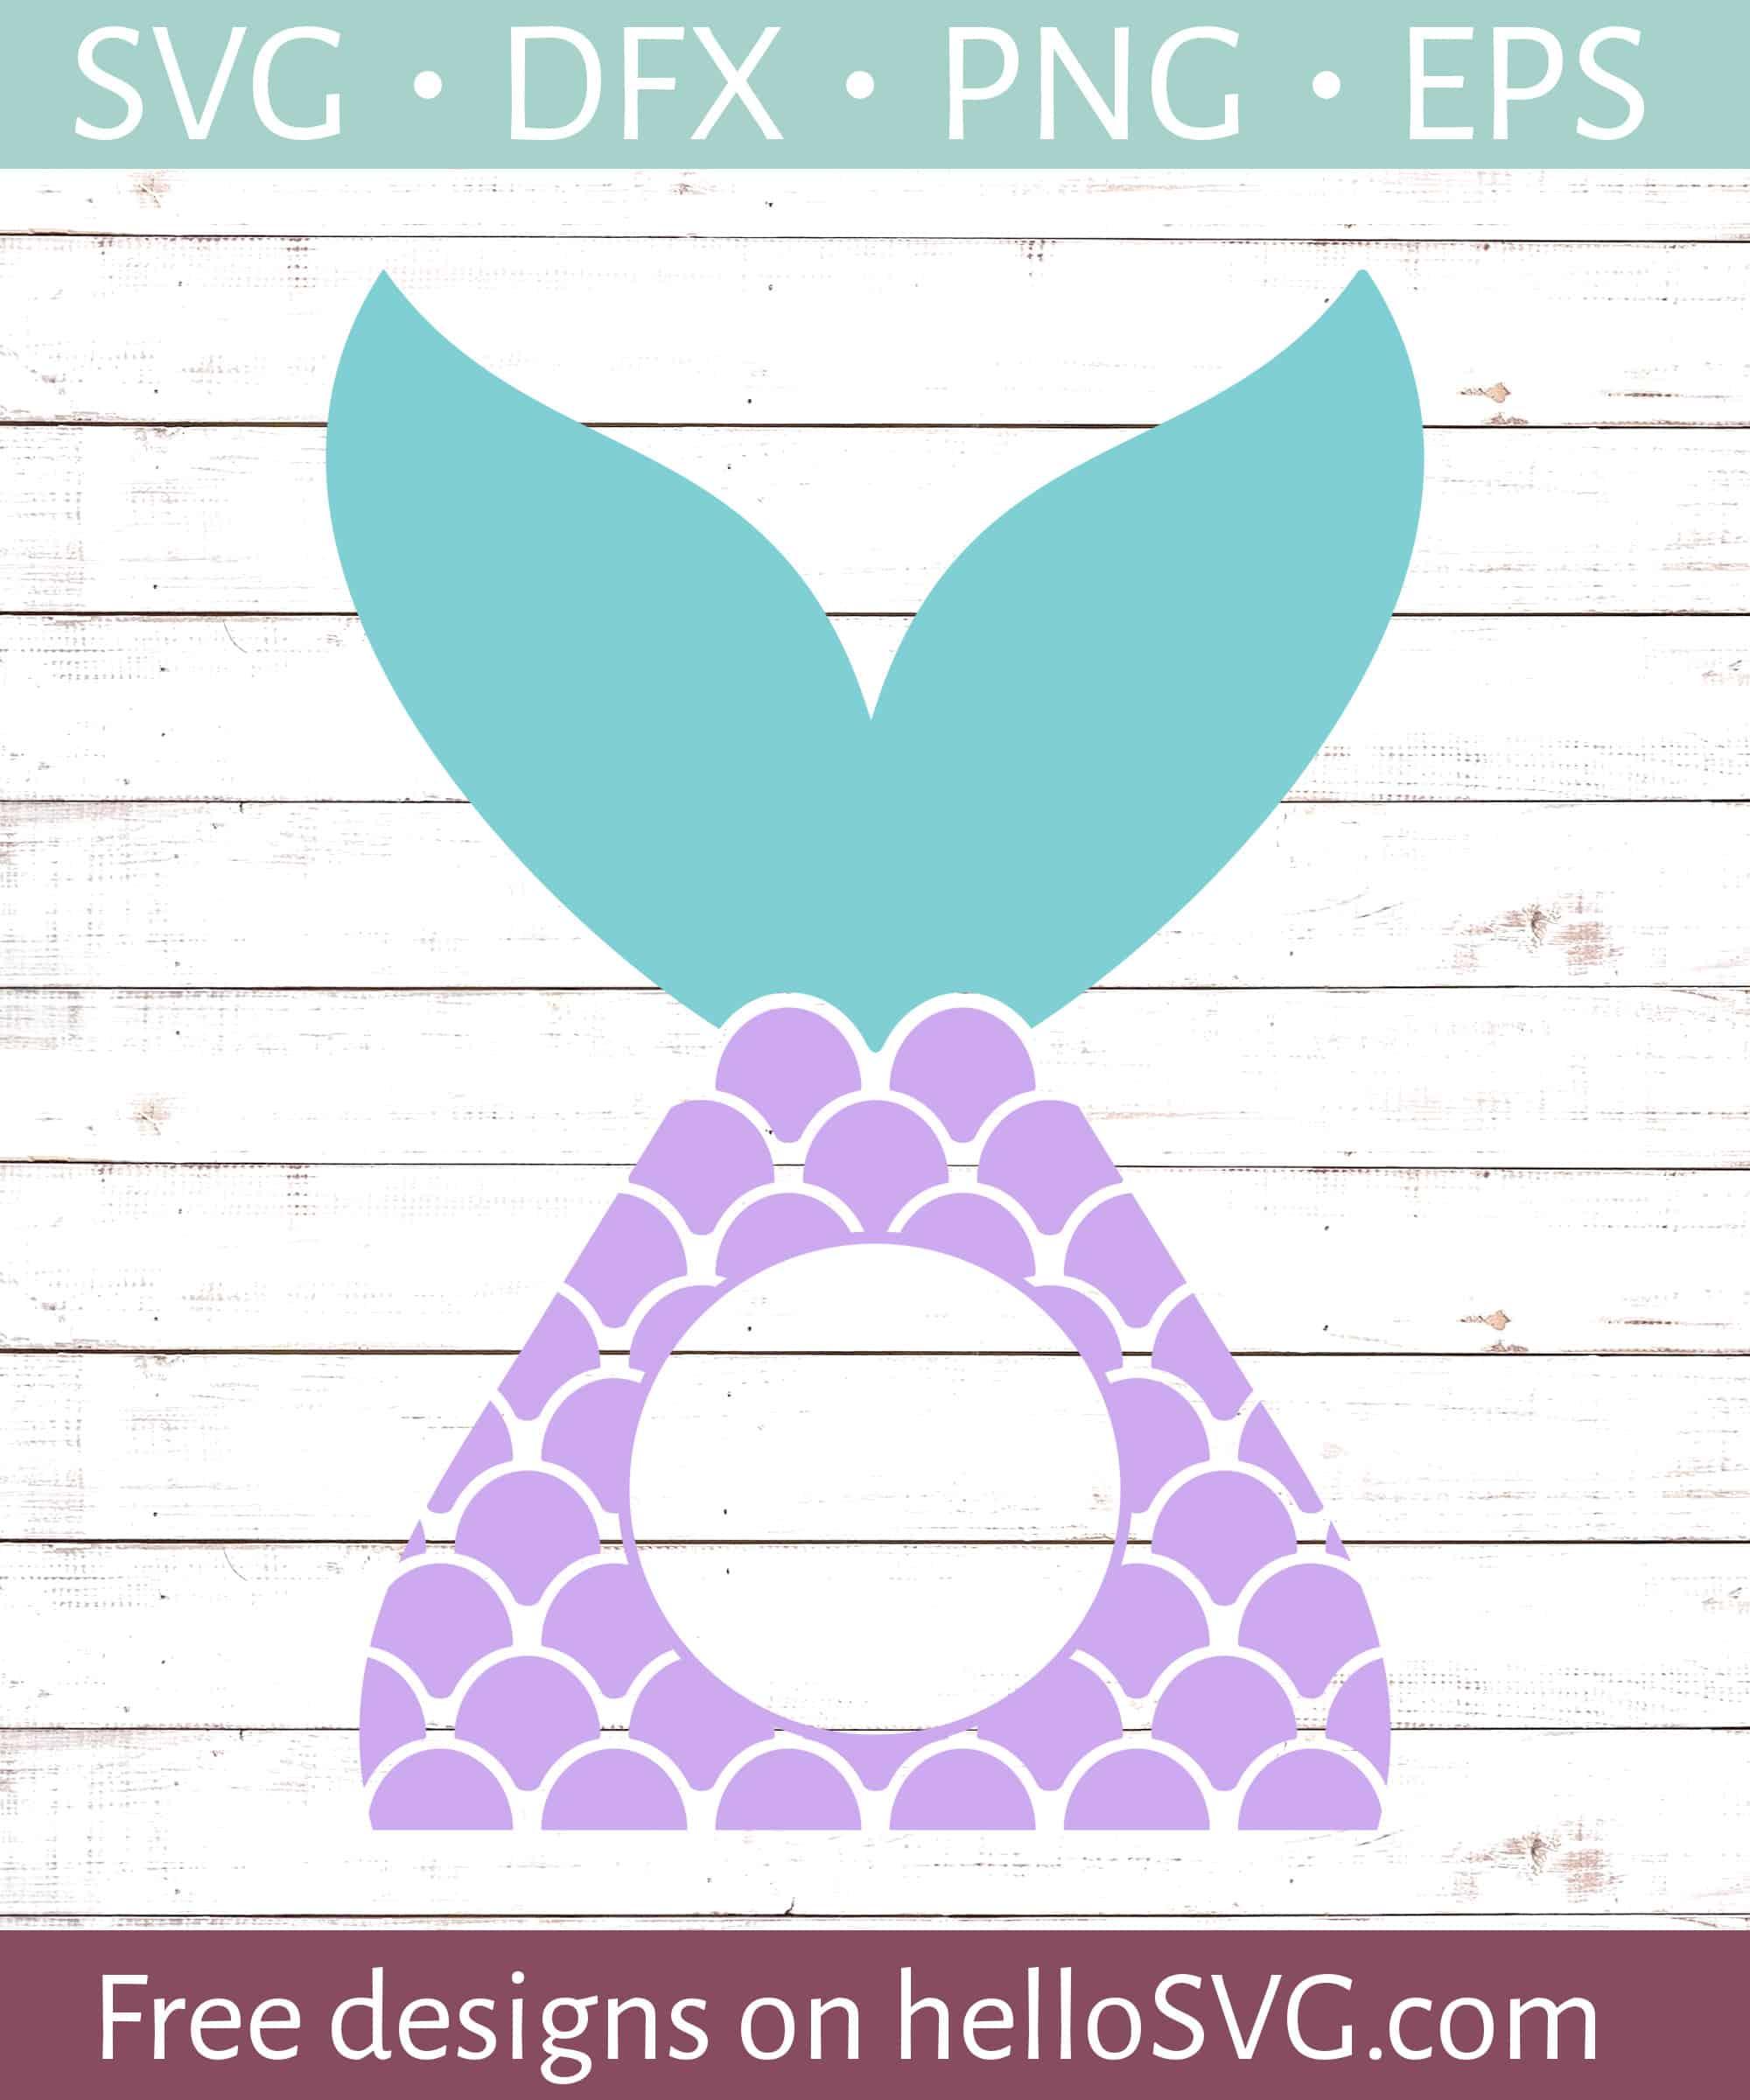 Monogram Mermaid Svg : monogram, mermaid, Mermaid, Circle, Monogram, Files, HelloSVG.com